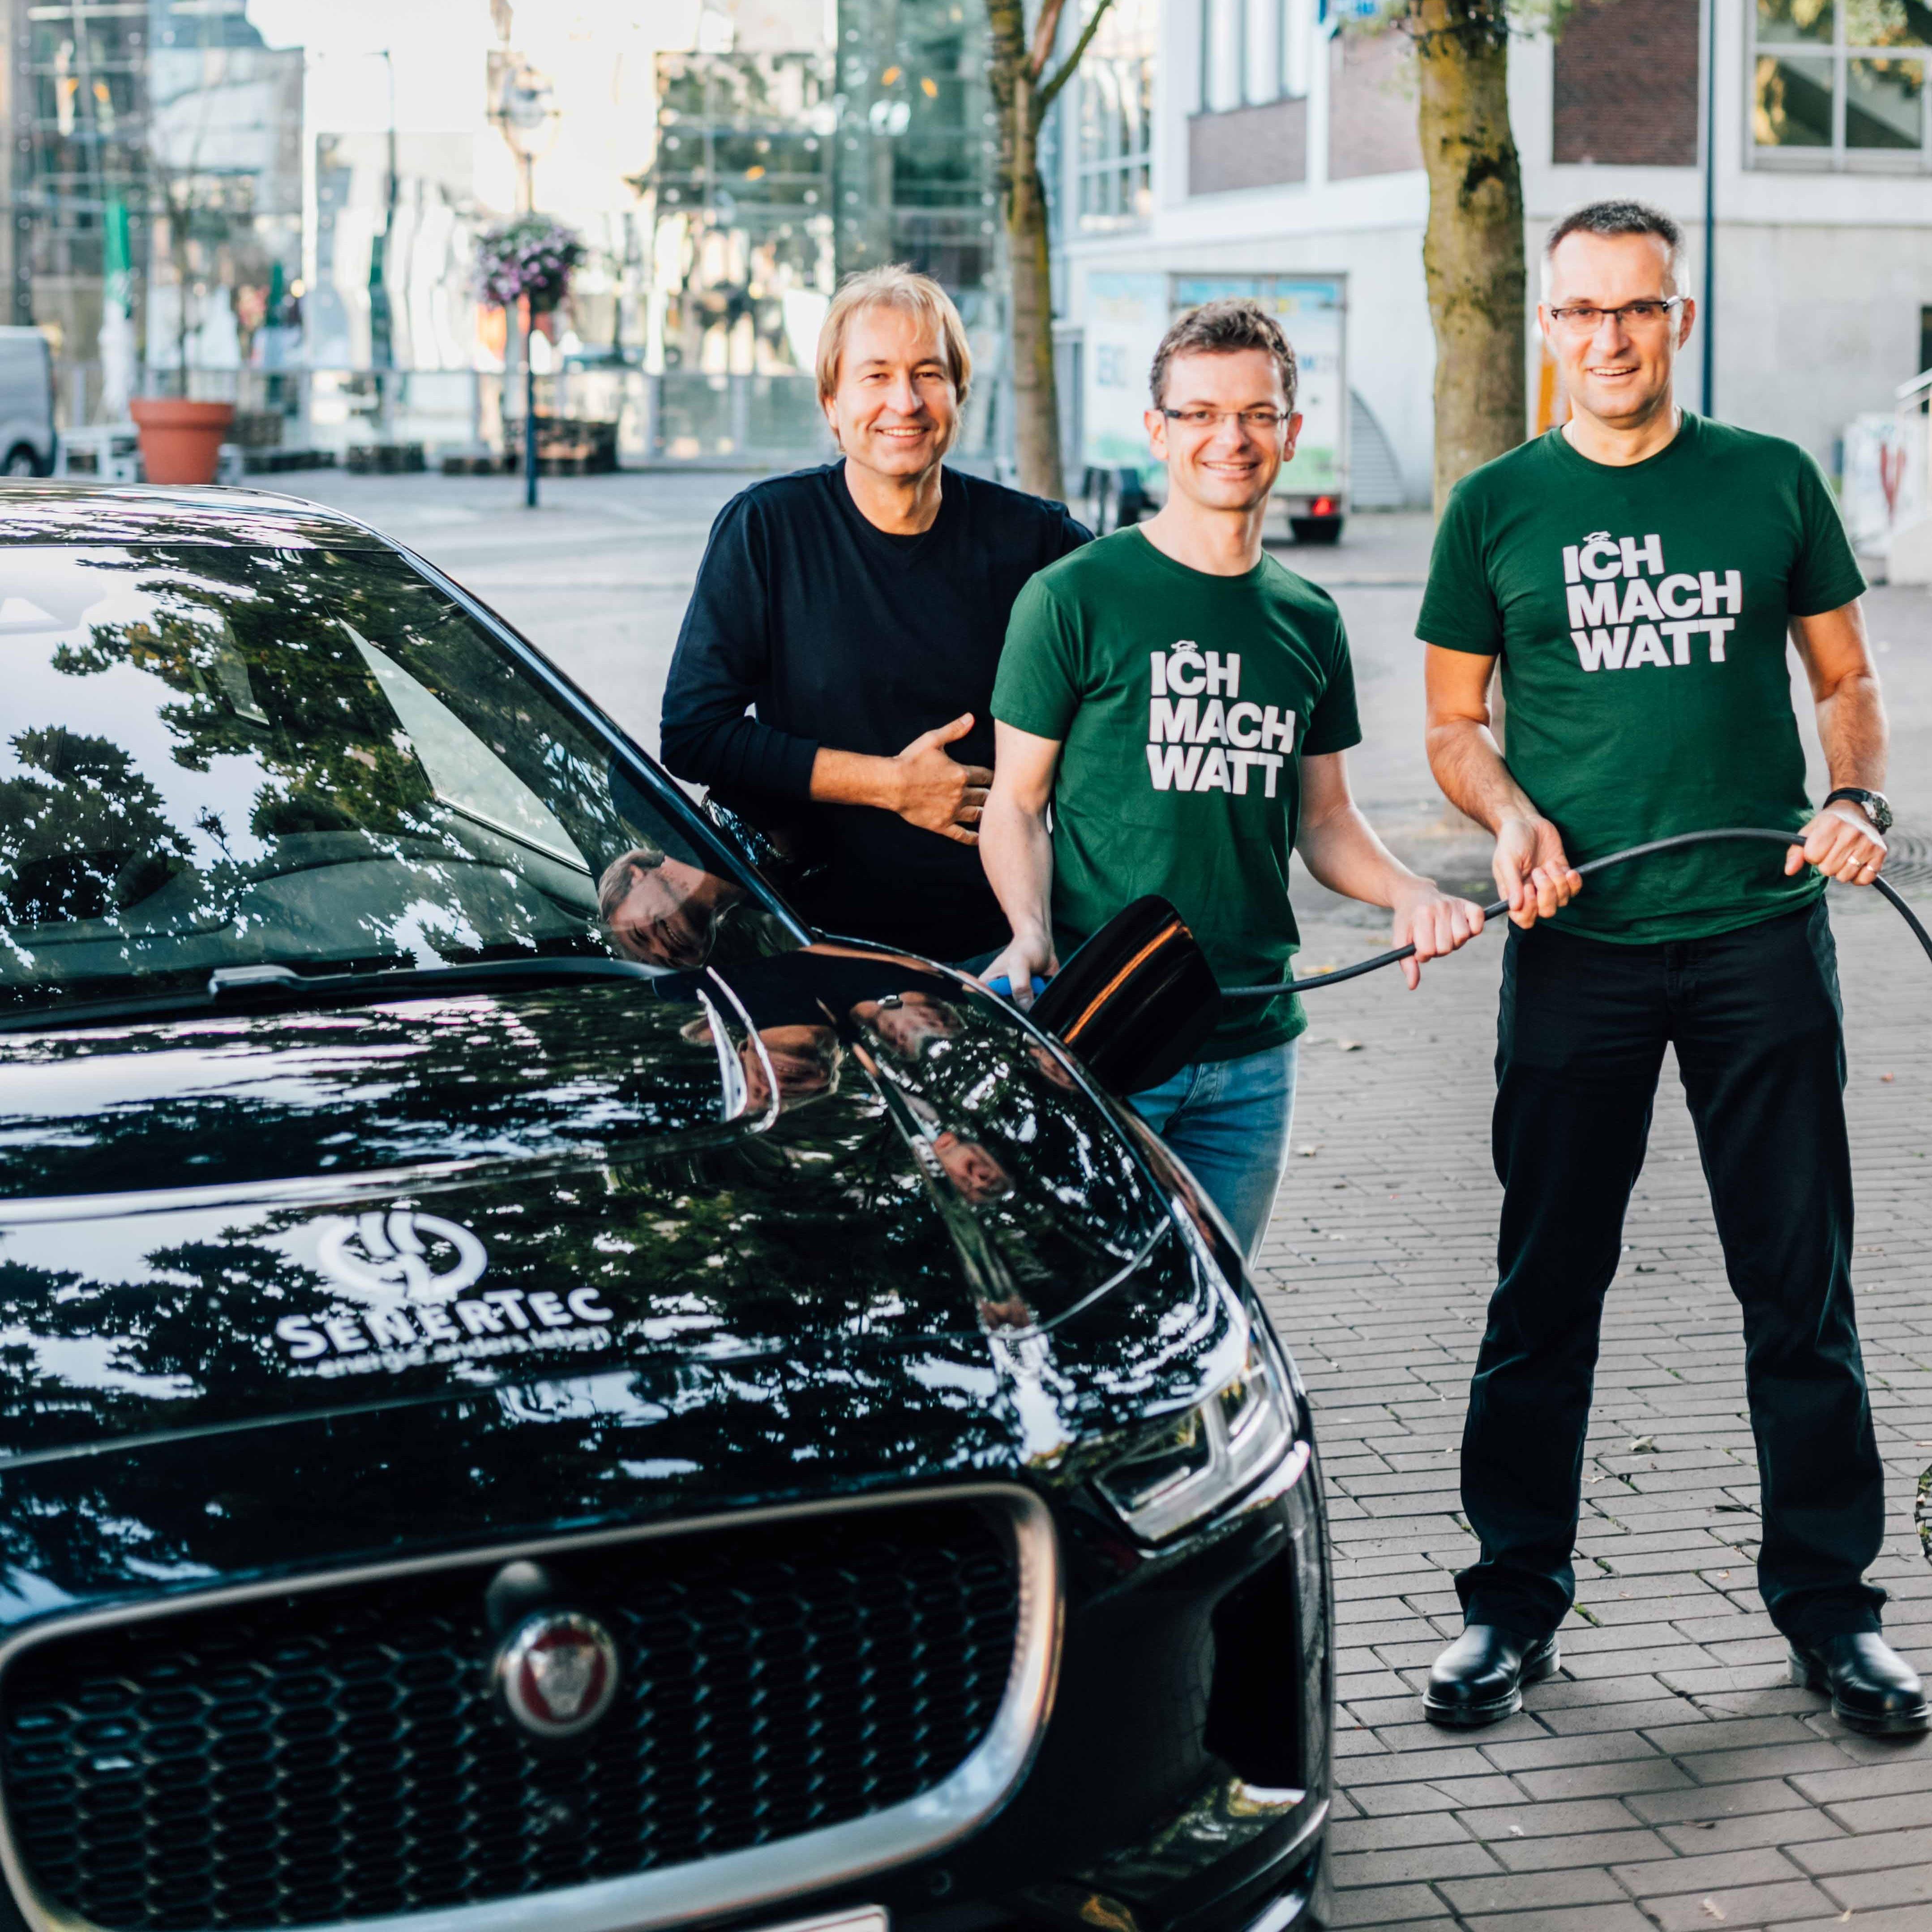 Das Team SenerTec steht mit Ladekabel neben dem E-Auto Jaguar I-PACE mit SenerTec-Branding.